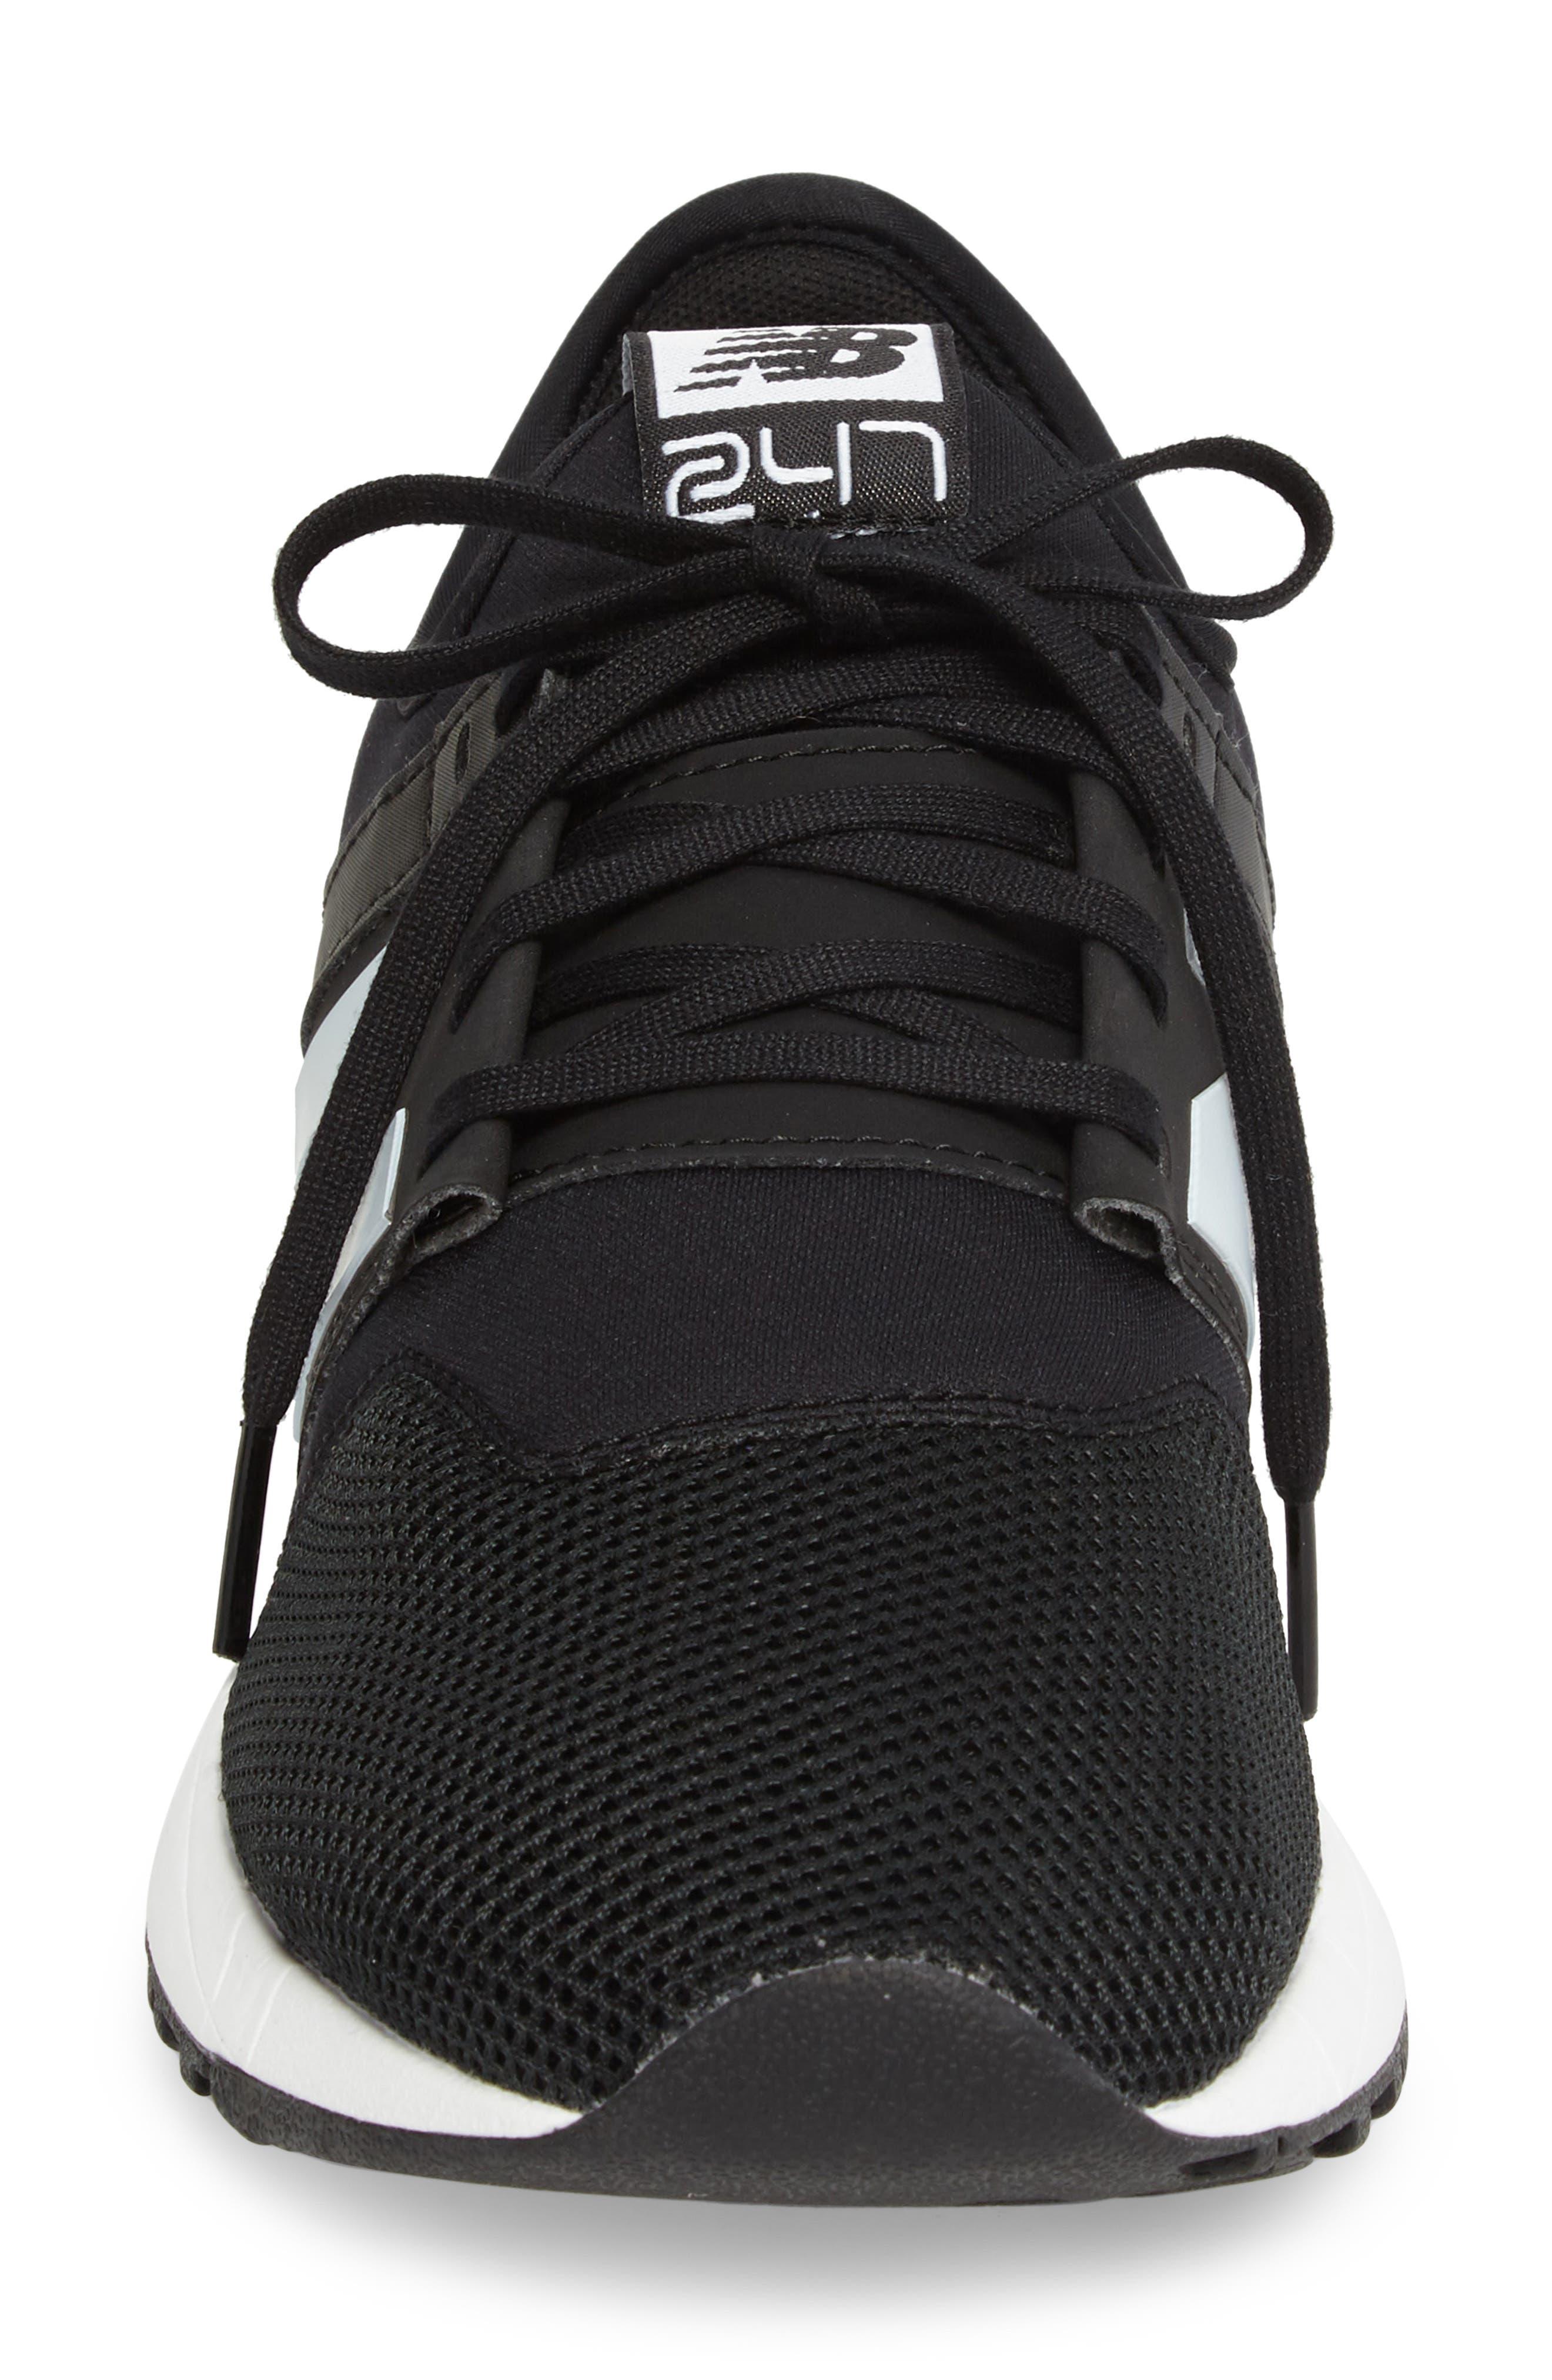 247 Modern Classic Sneaker,                             Alternate thumbnail 4, color,                             001